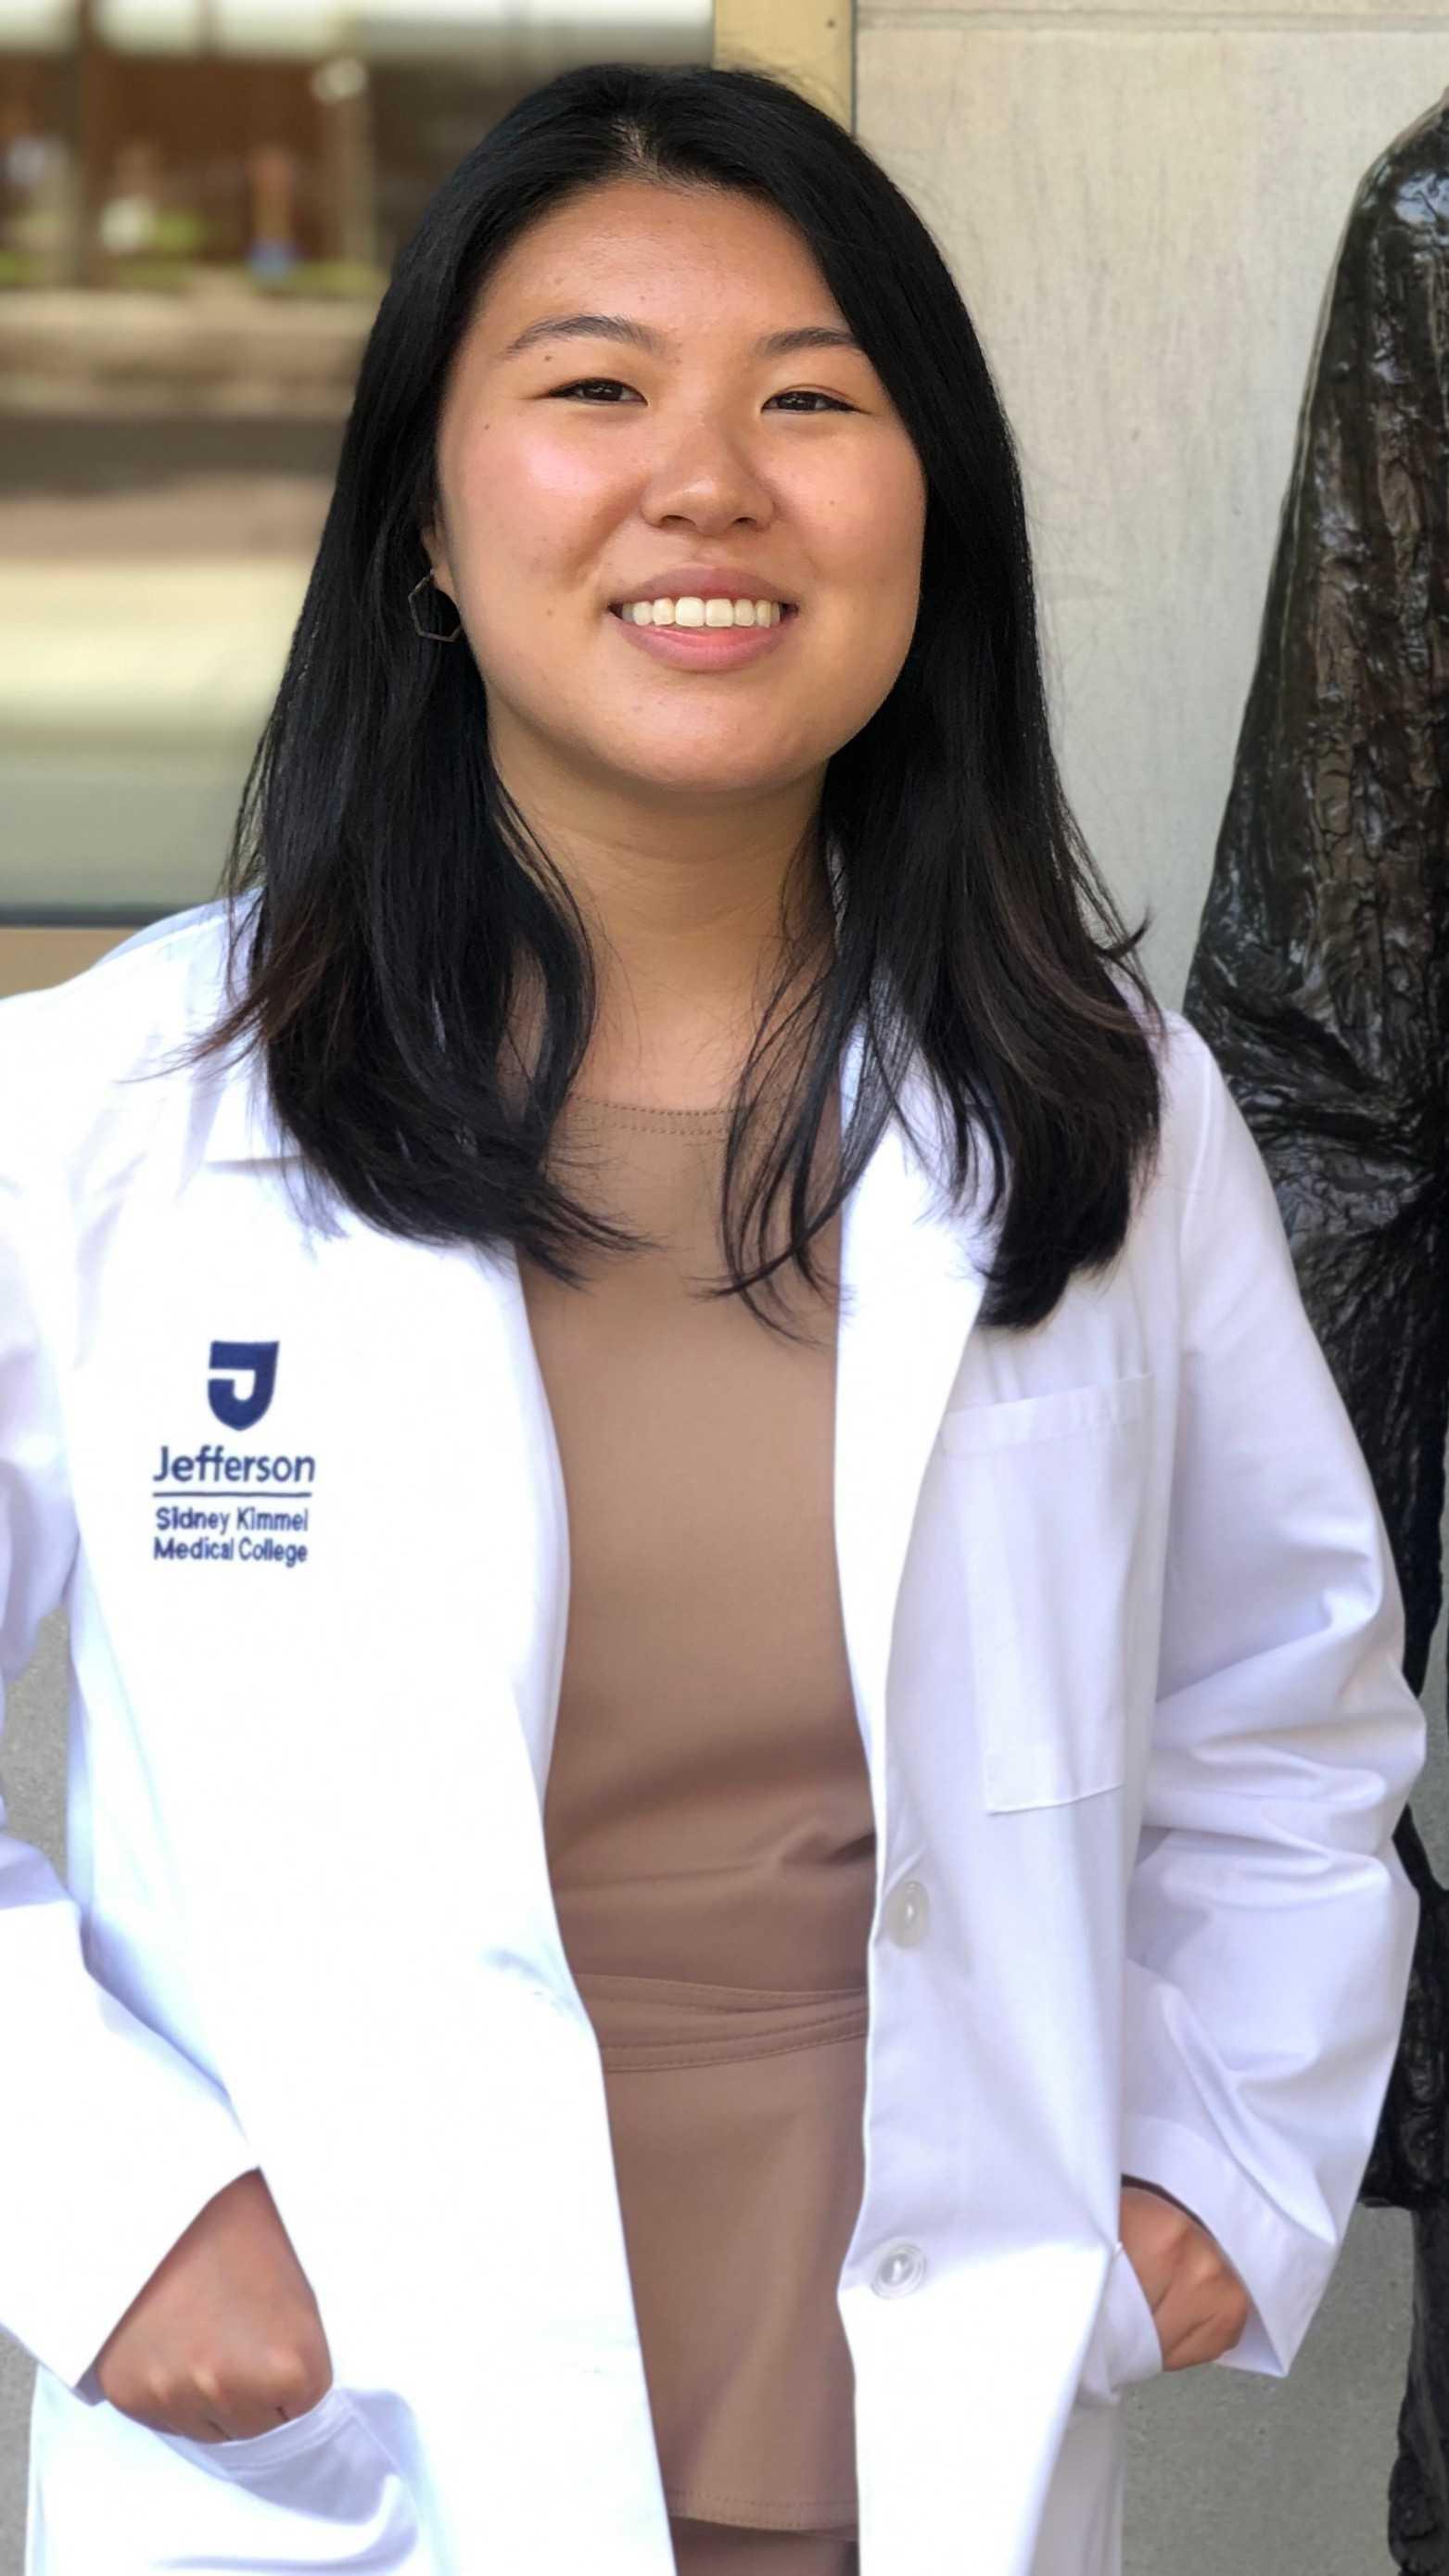 Author Jasmine Phun